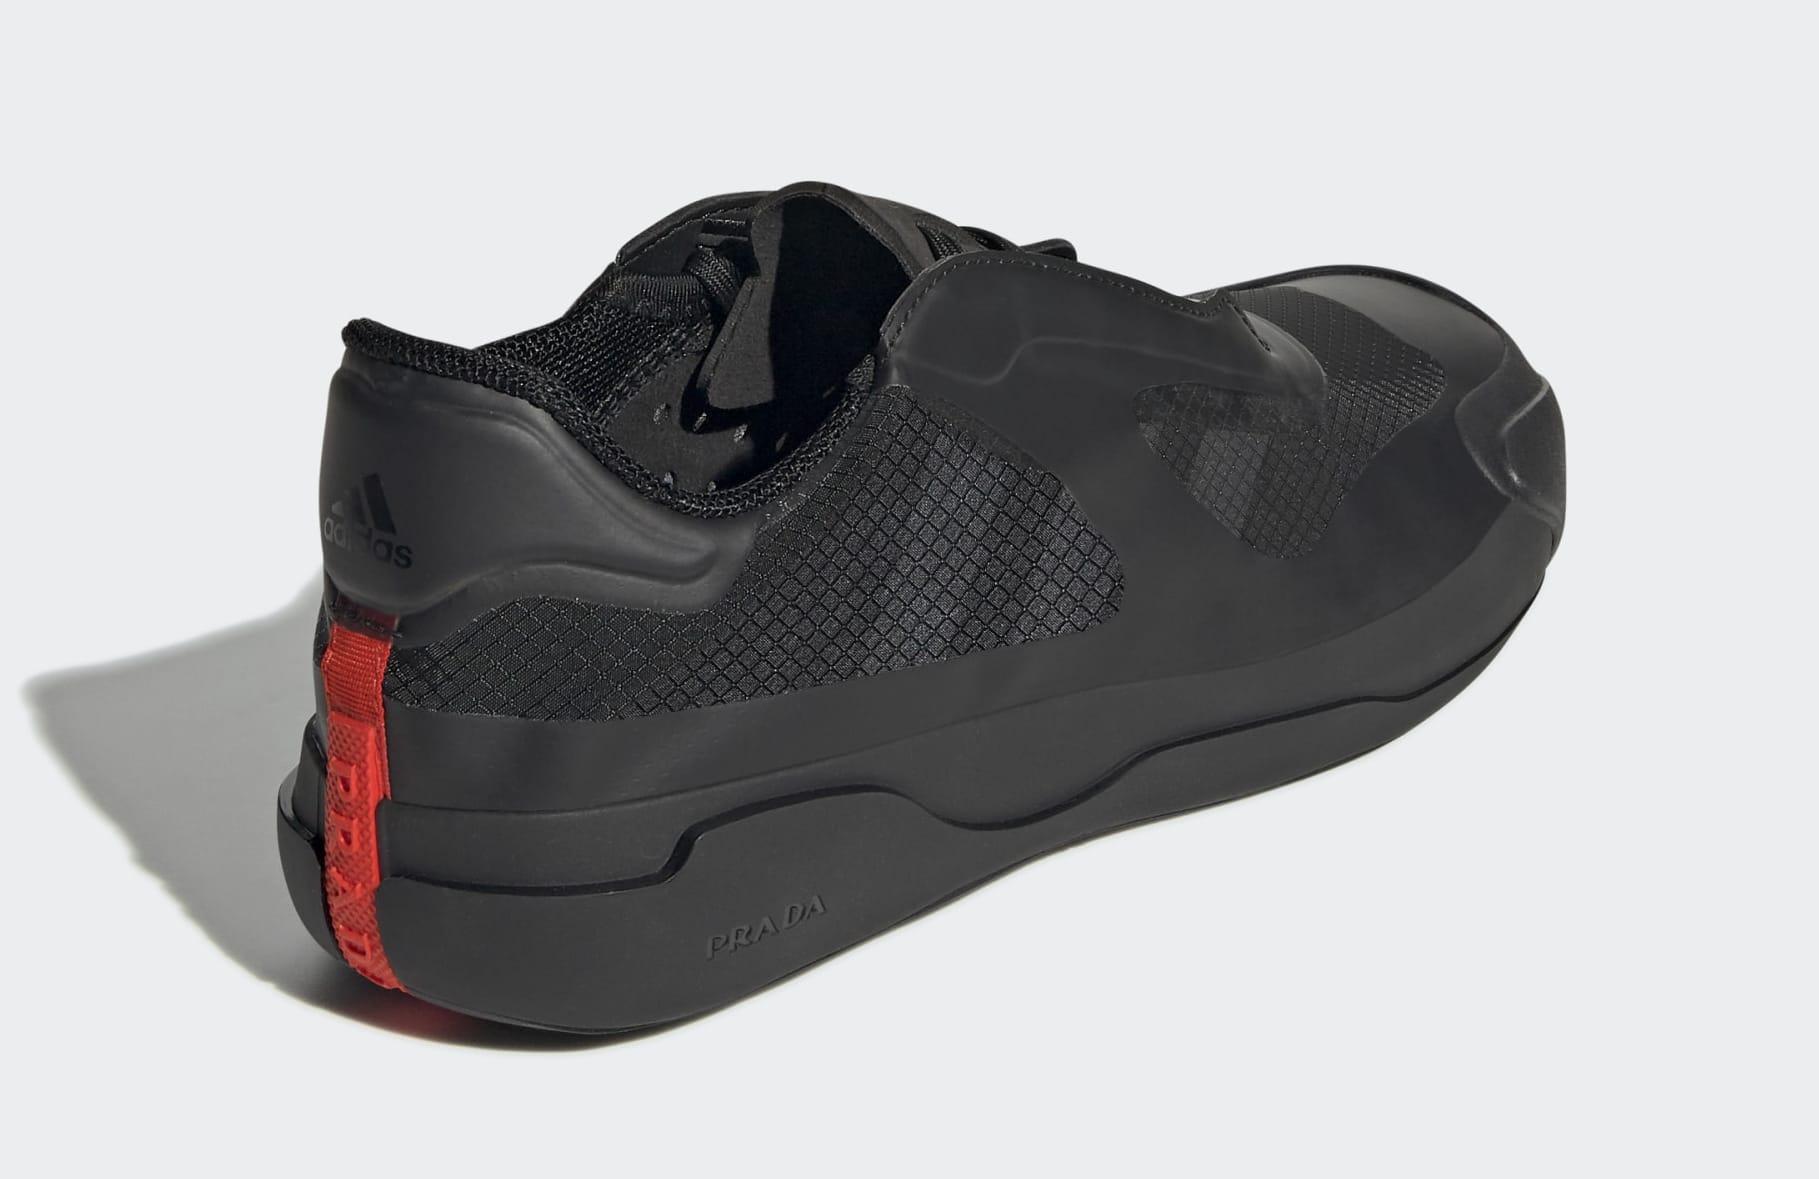 Prada x Adidas Luna Rossa 21 'Core Black' G57868 Talon